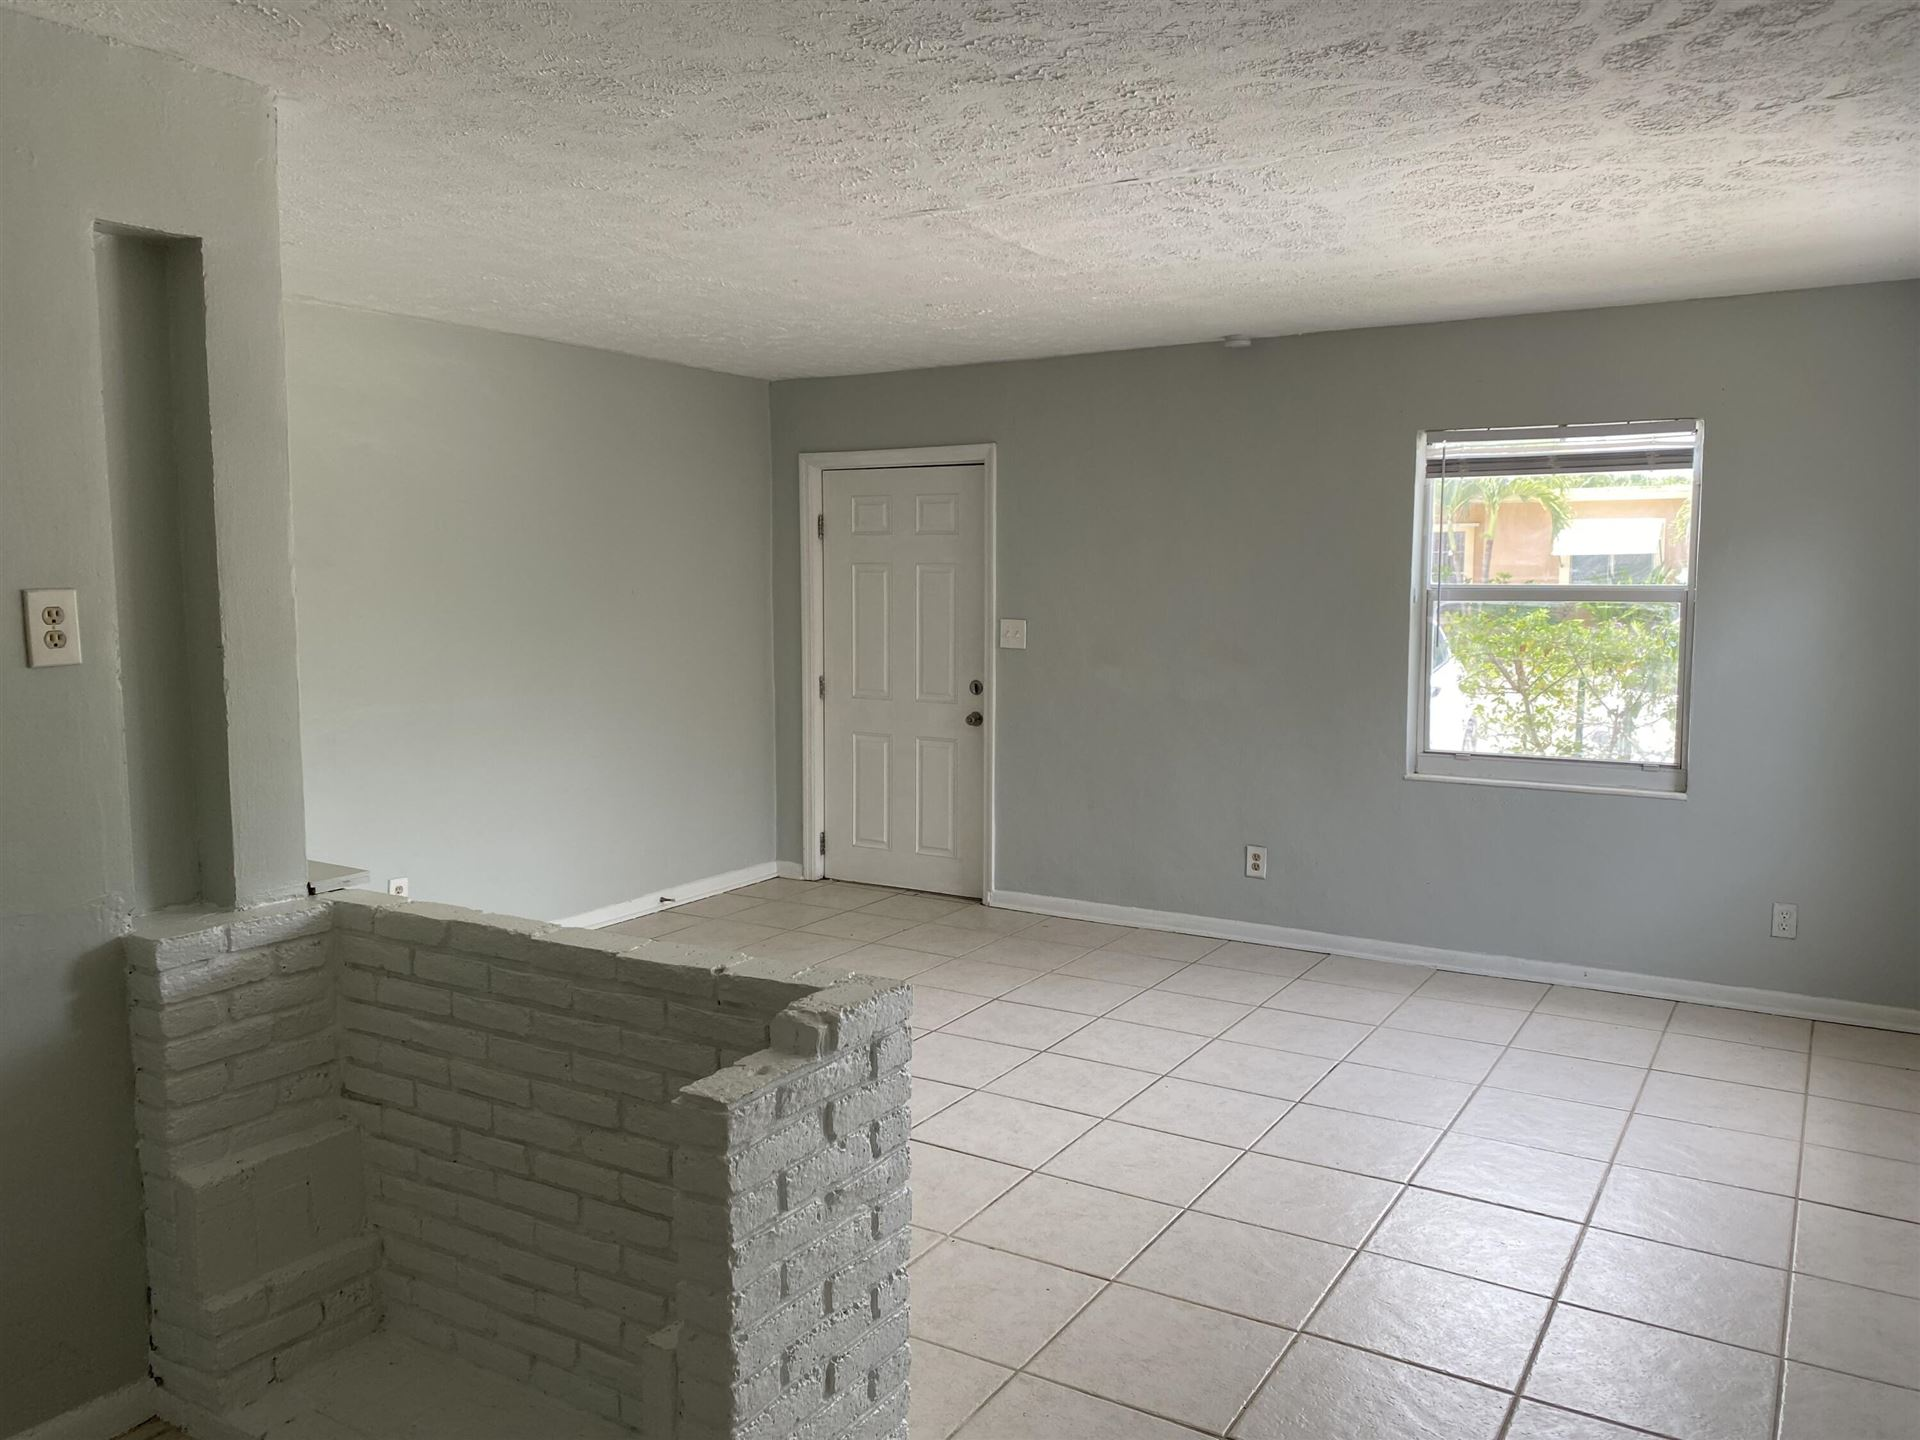 Photo of 1820 Redbank Road # 1, North Palm Beach, FL 33408 (MLS # RX-10724555)